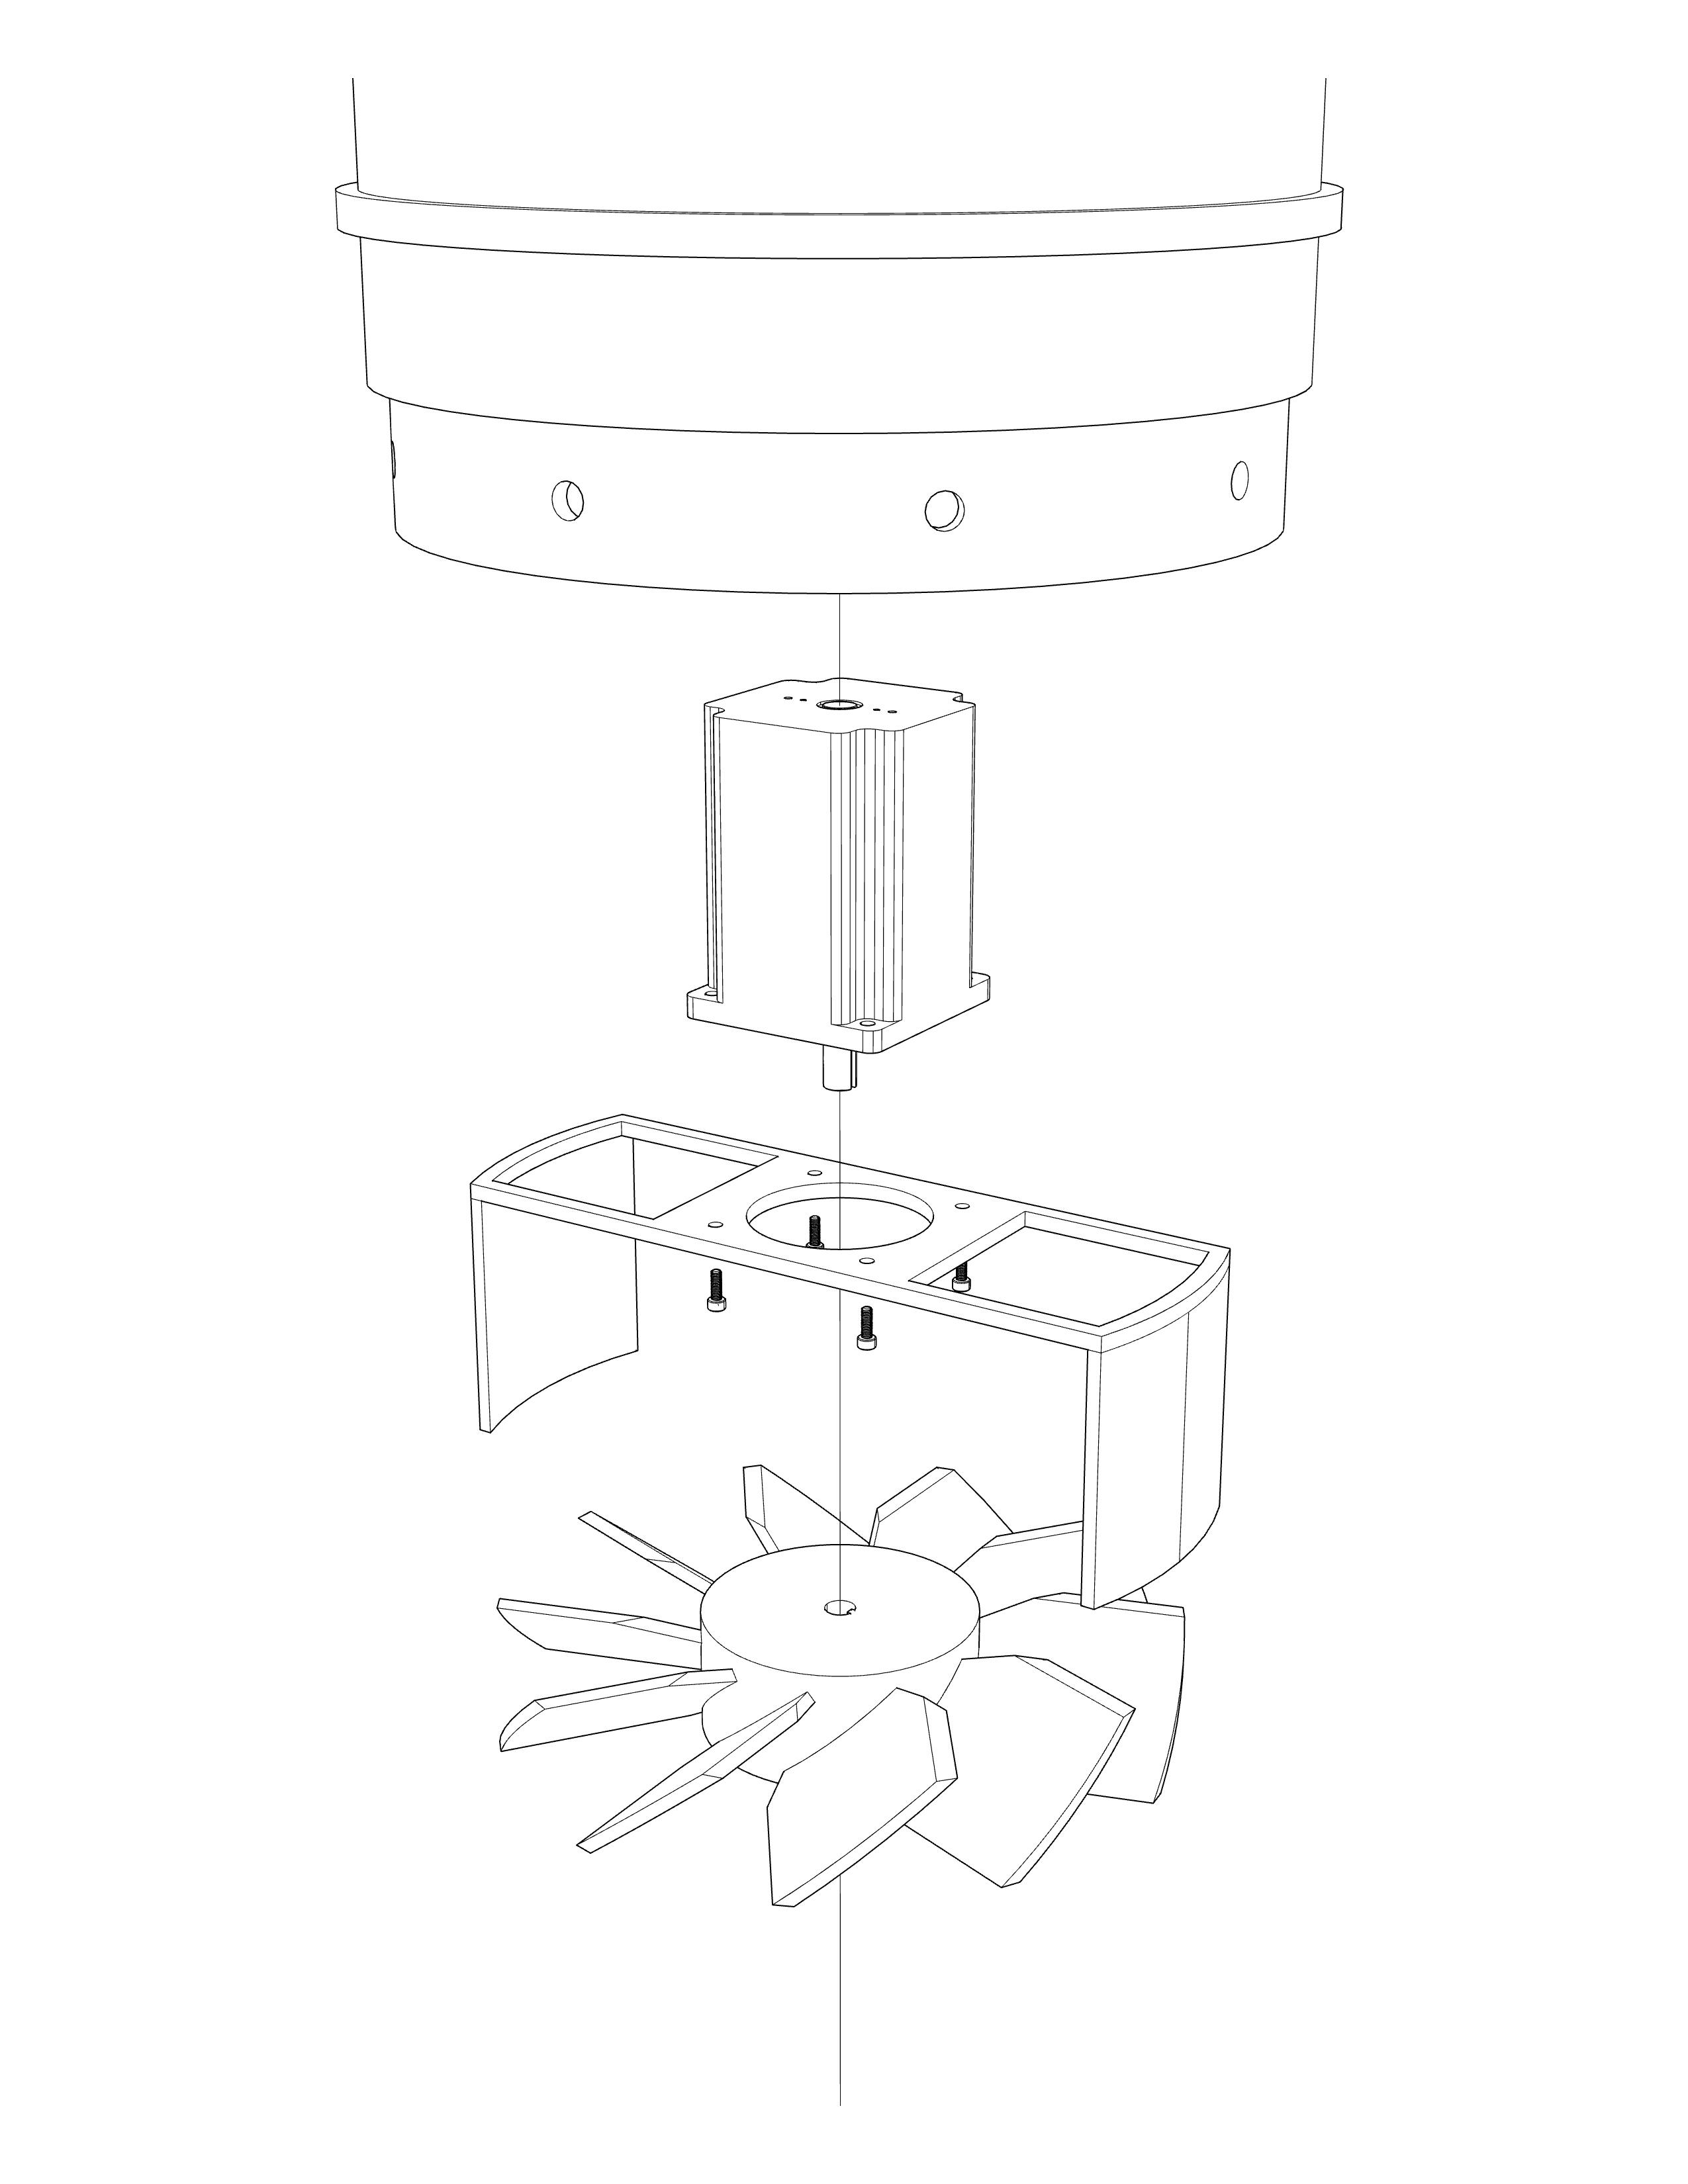 detail_turbine3